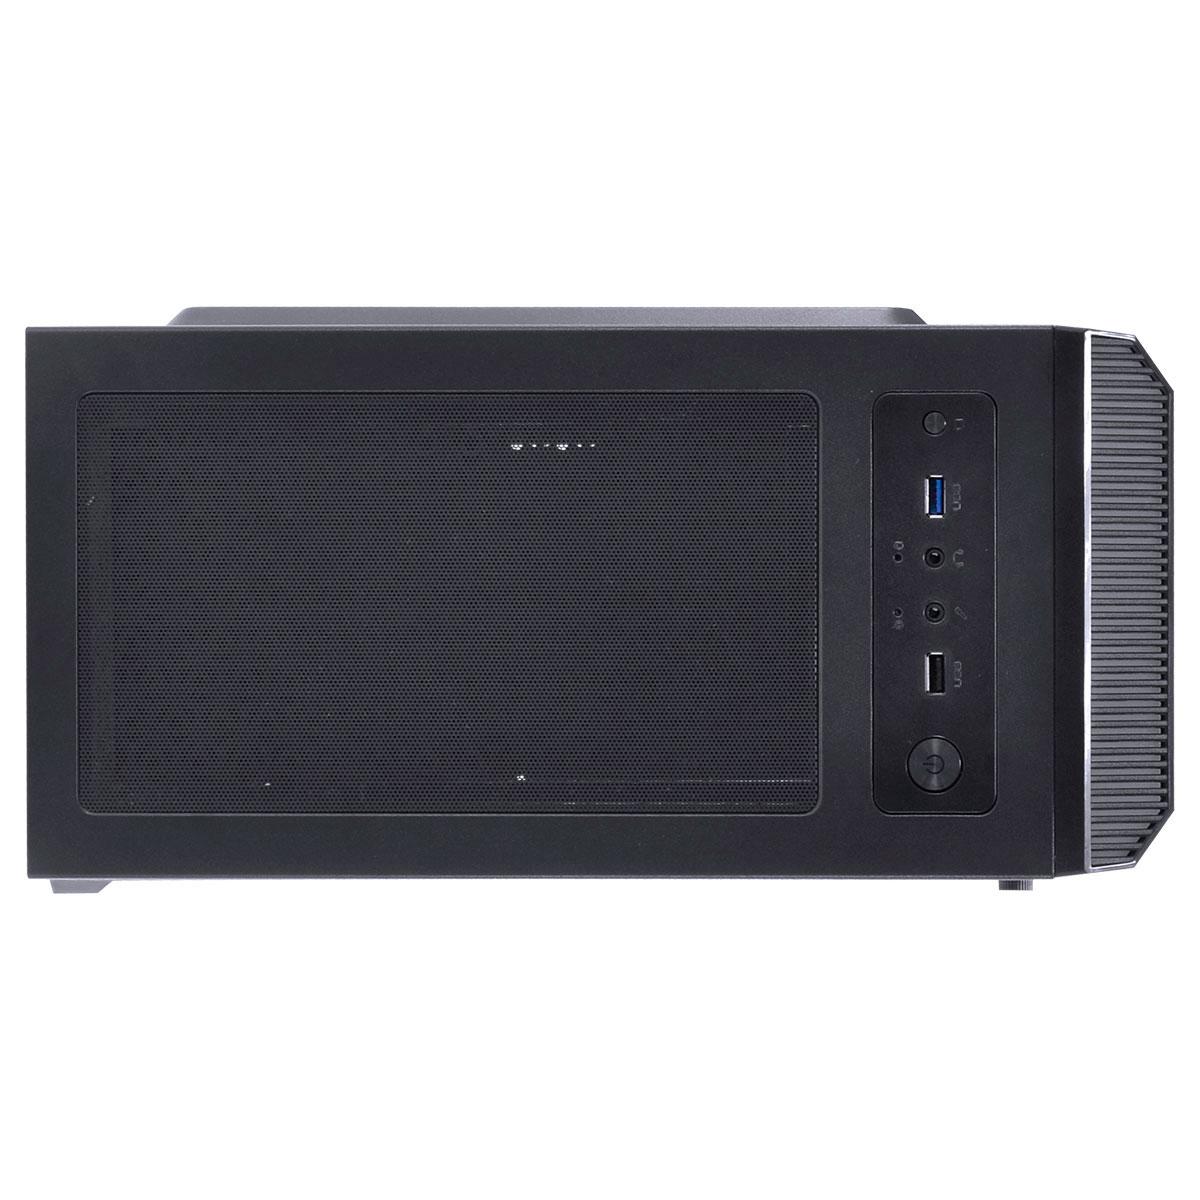 Gabinete Gamer Vinik VX Gaming Borealis, Fita LED RGB, Lateral em Acrílico C/ Dobradiça - 32296